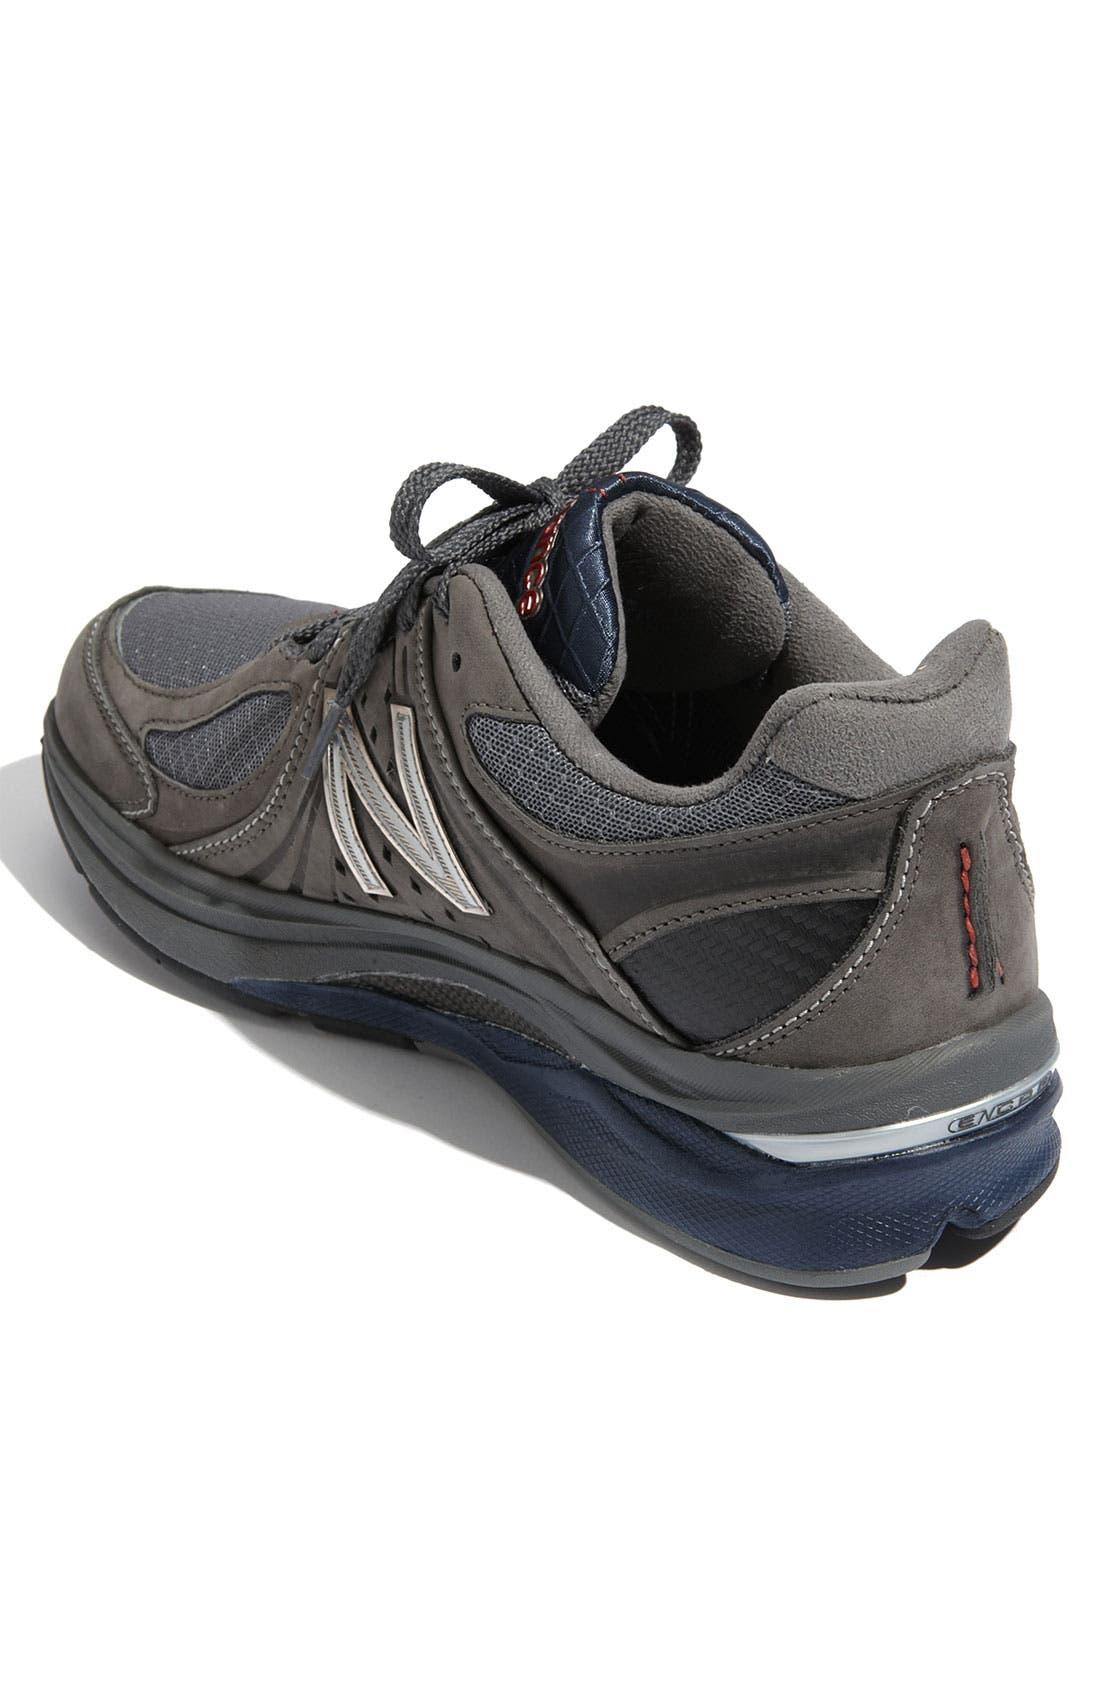 Alternate Image 2  - New Balance 'Heritage Collection - 2040' Running Shoe (Men)